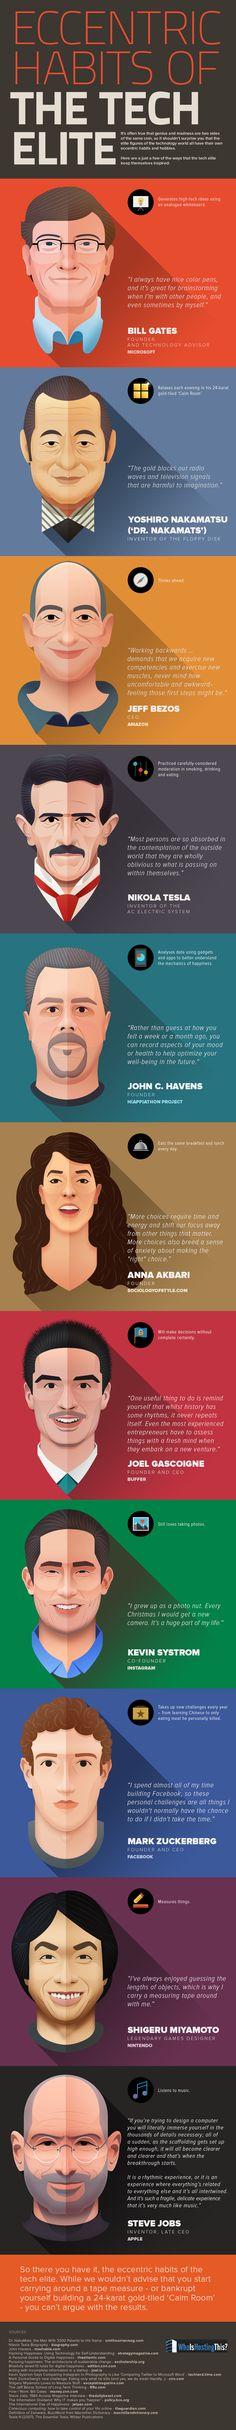 11 Eccentric Habits of the Tech Elite - http://dashburst.com/infographic/eccentric-habits-of-tech-elite/